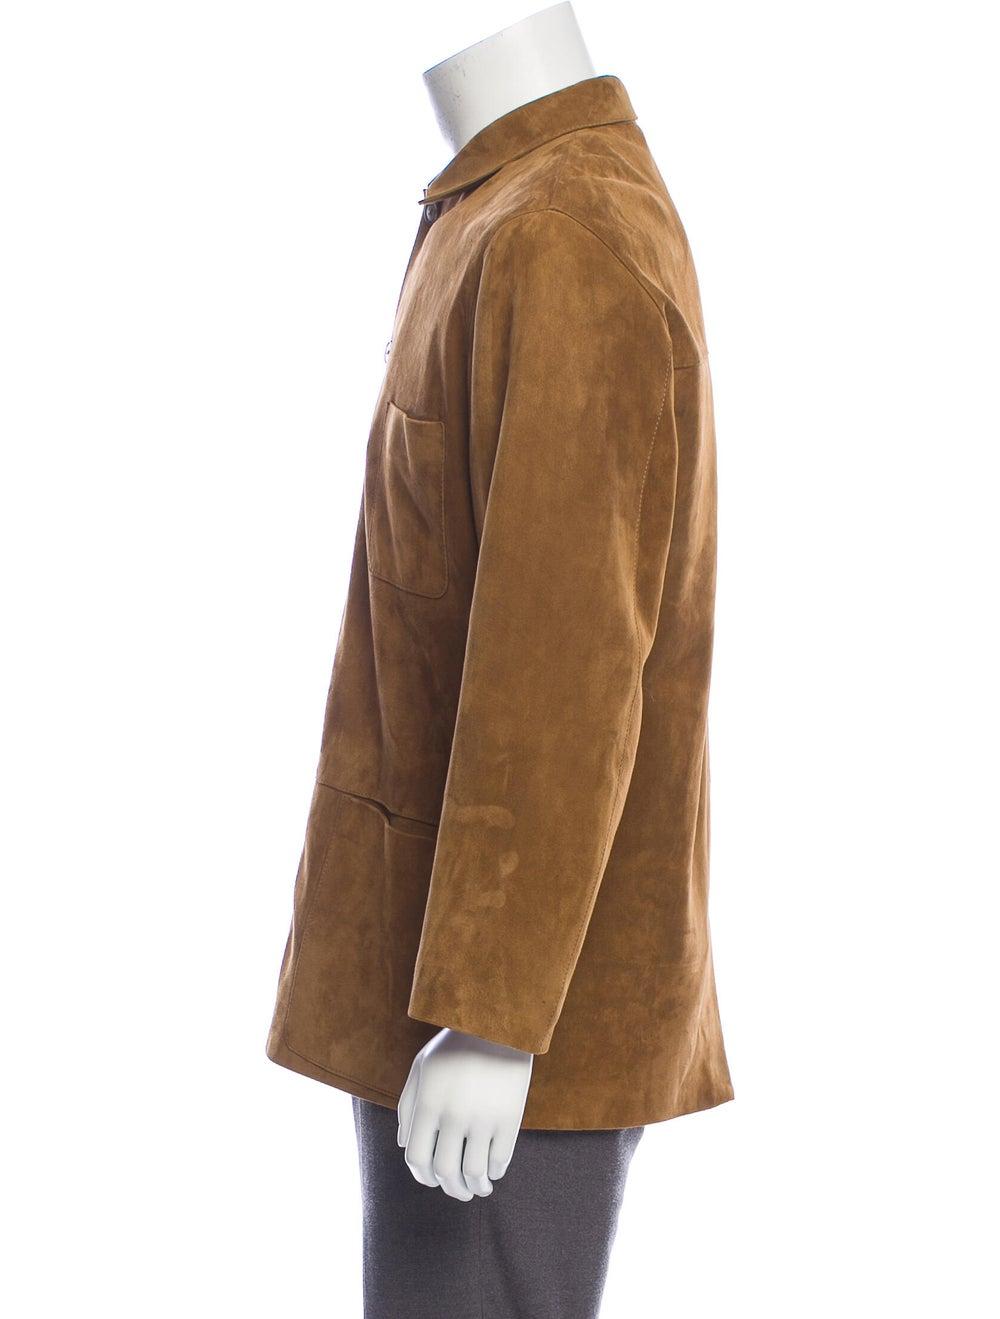 Bijan Suede Shirt Jacket - image 2